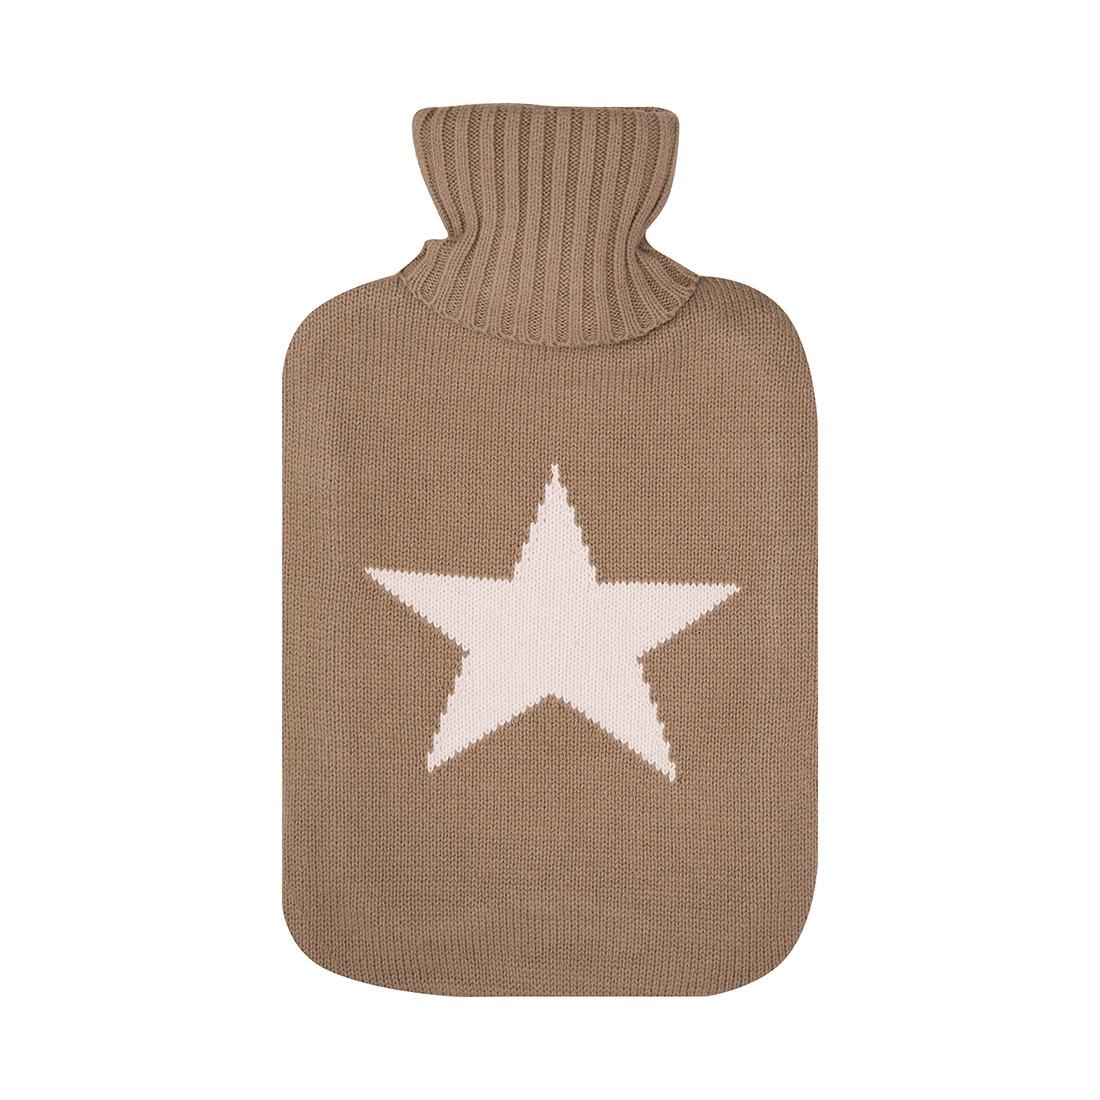 Wärmflasche Big Star – Braun, Tom Tailor günstig kaufen